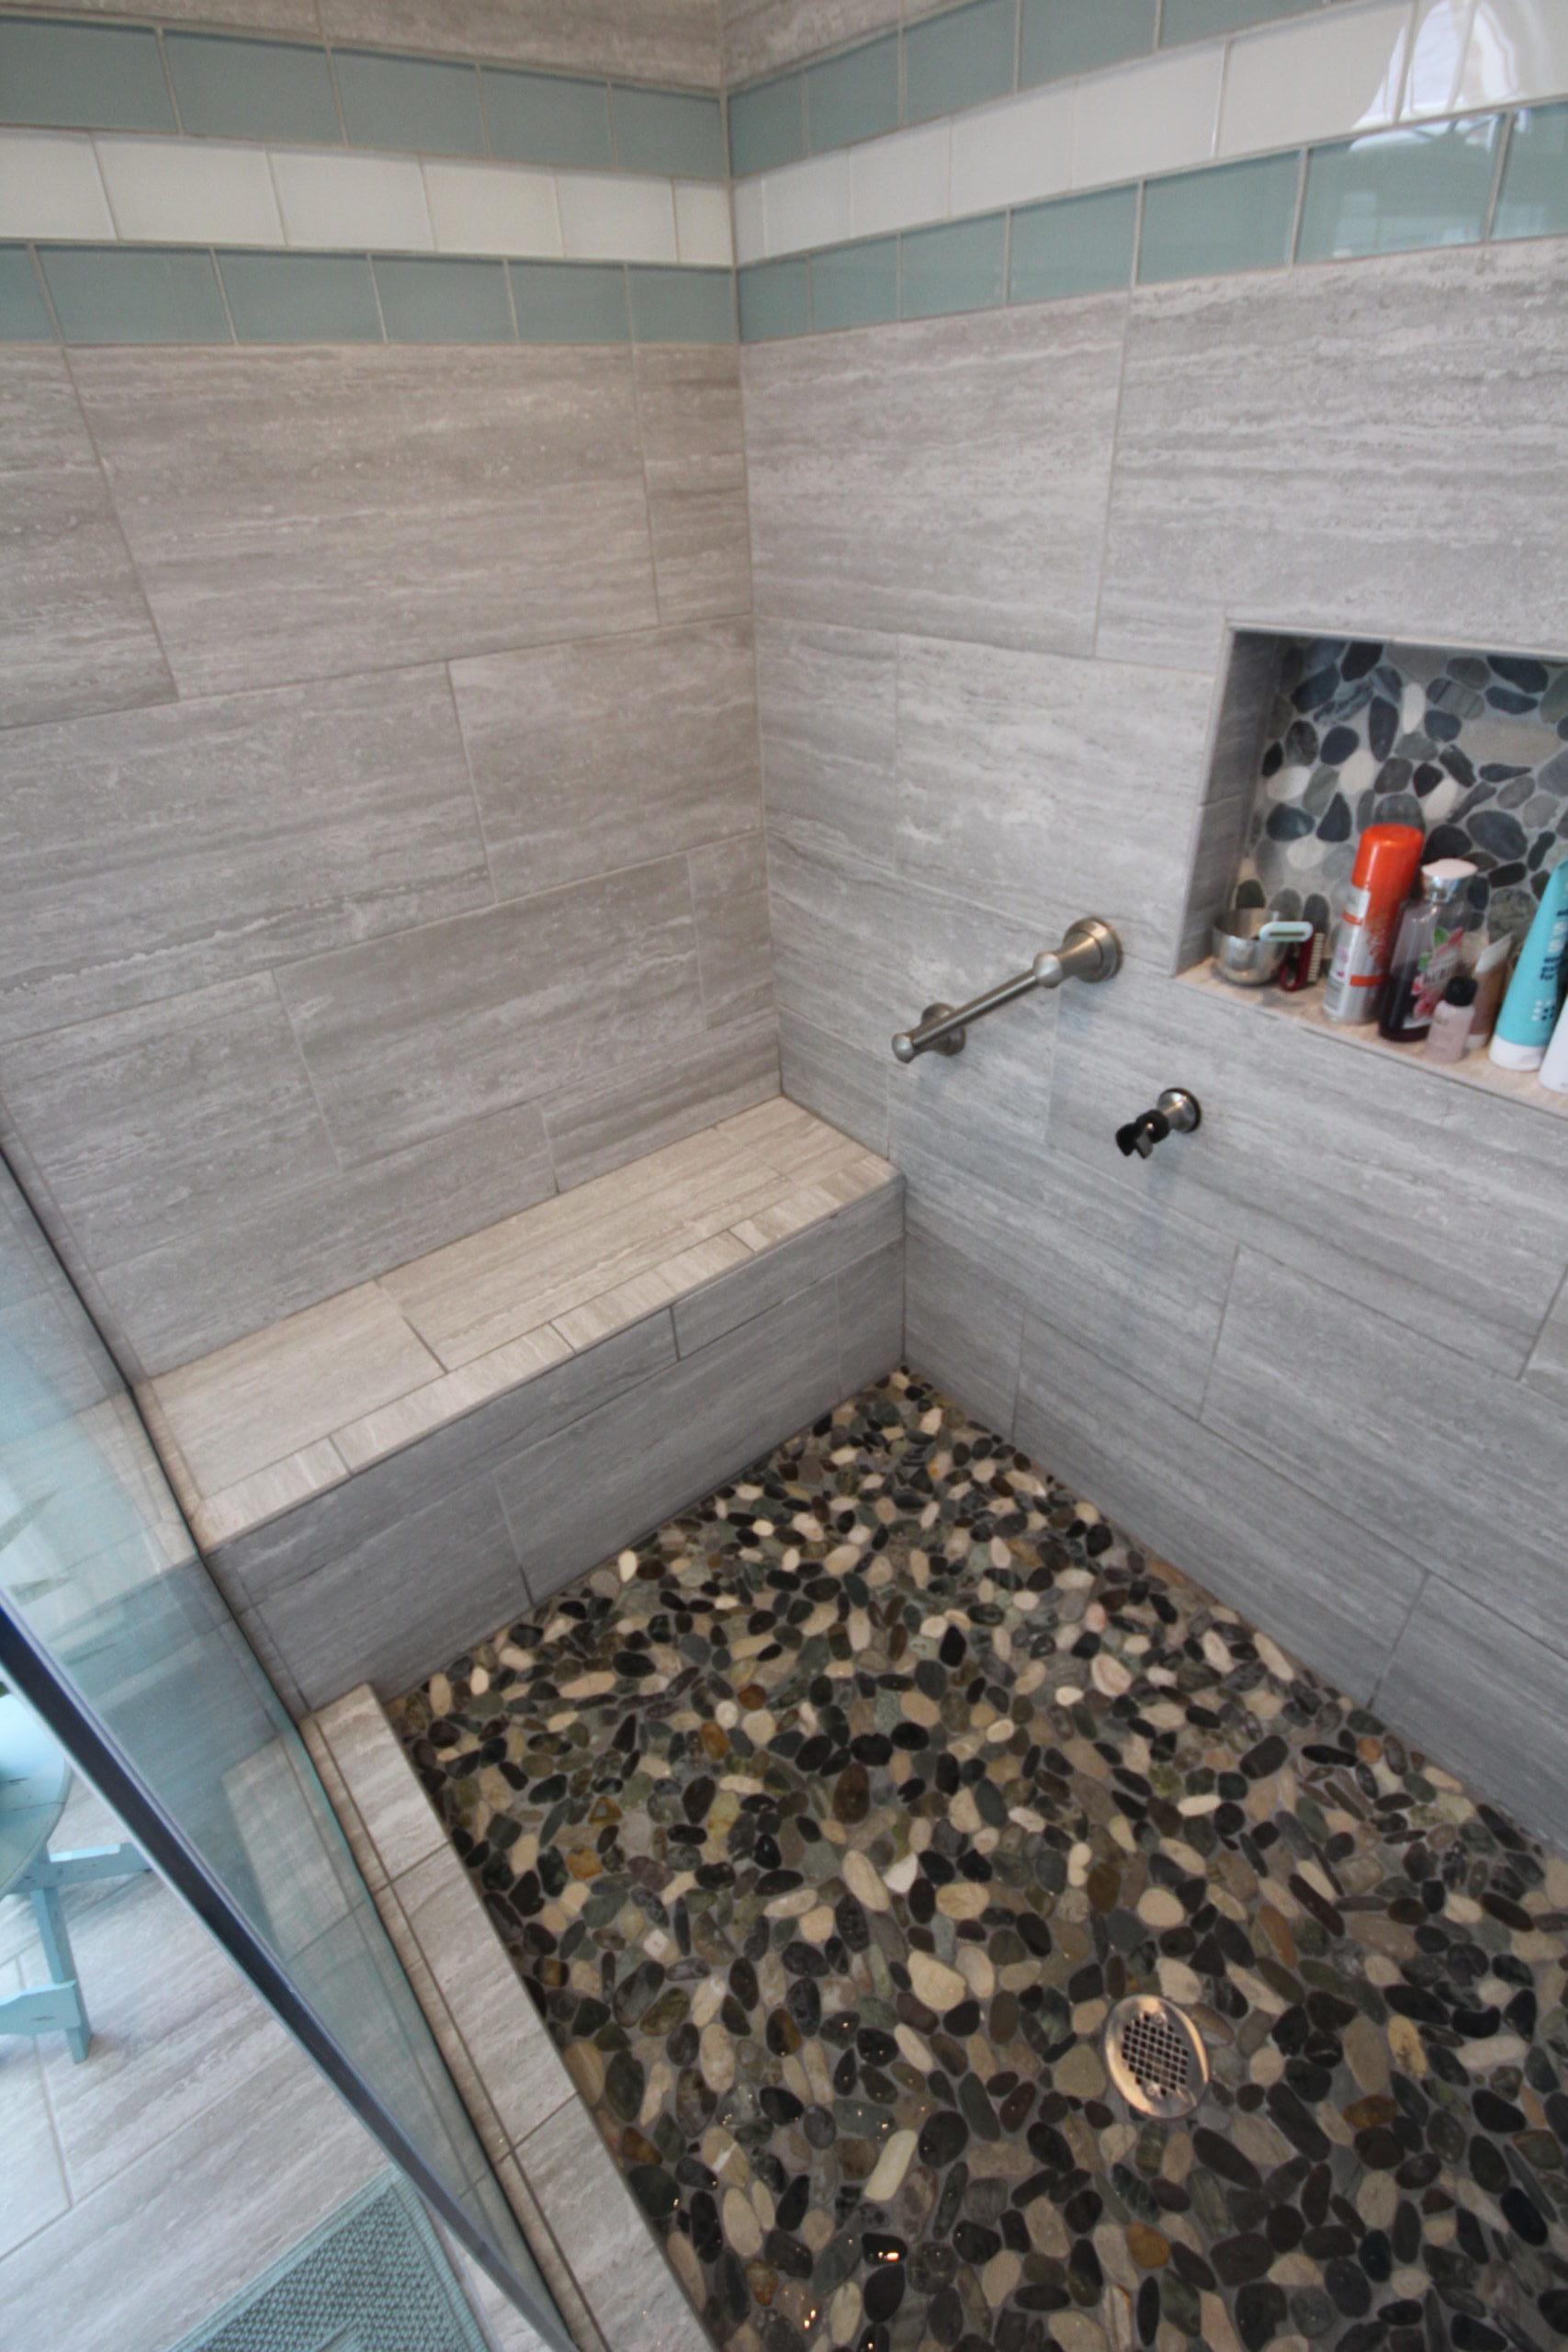 bathroom-remodeling-work-TAG-Builders-232-GV-Bathroom-Remodel-5-scaled-e1586519123552